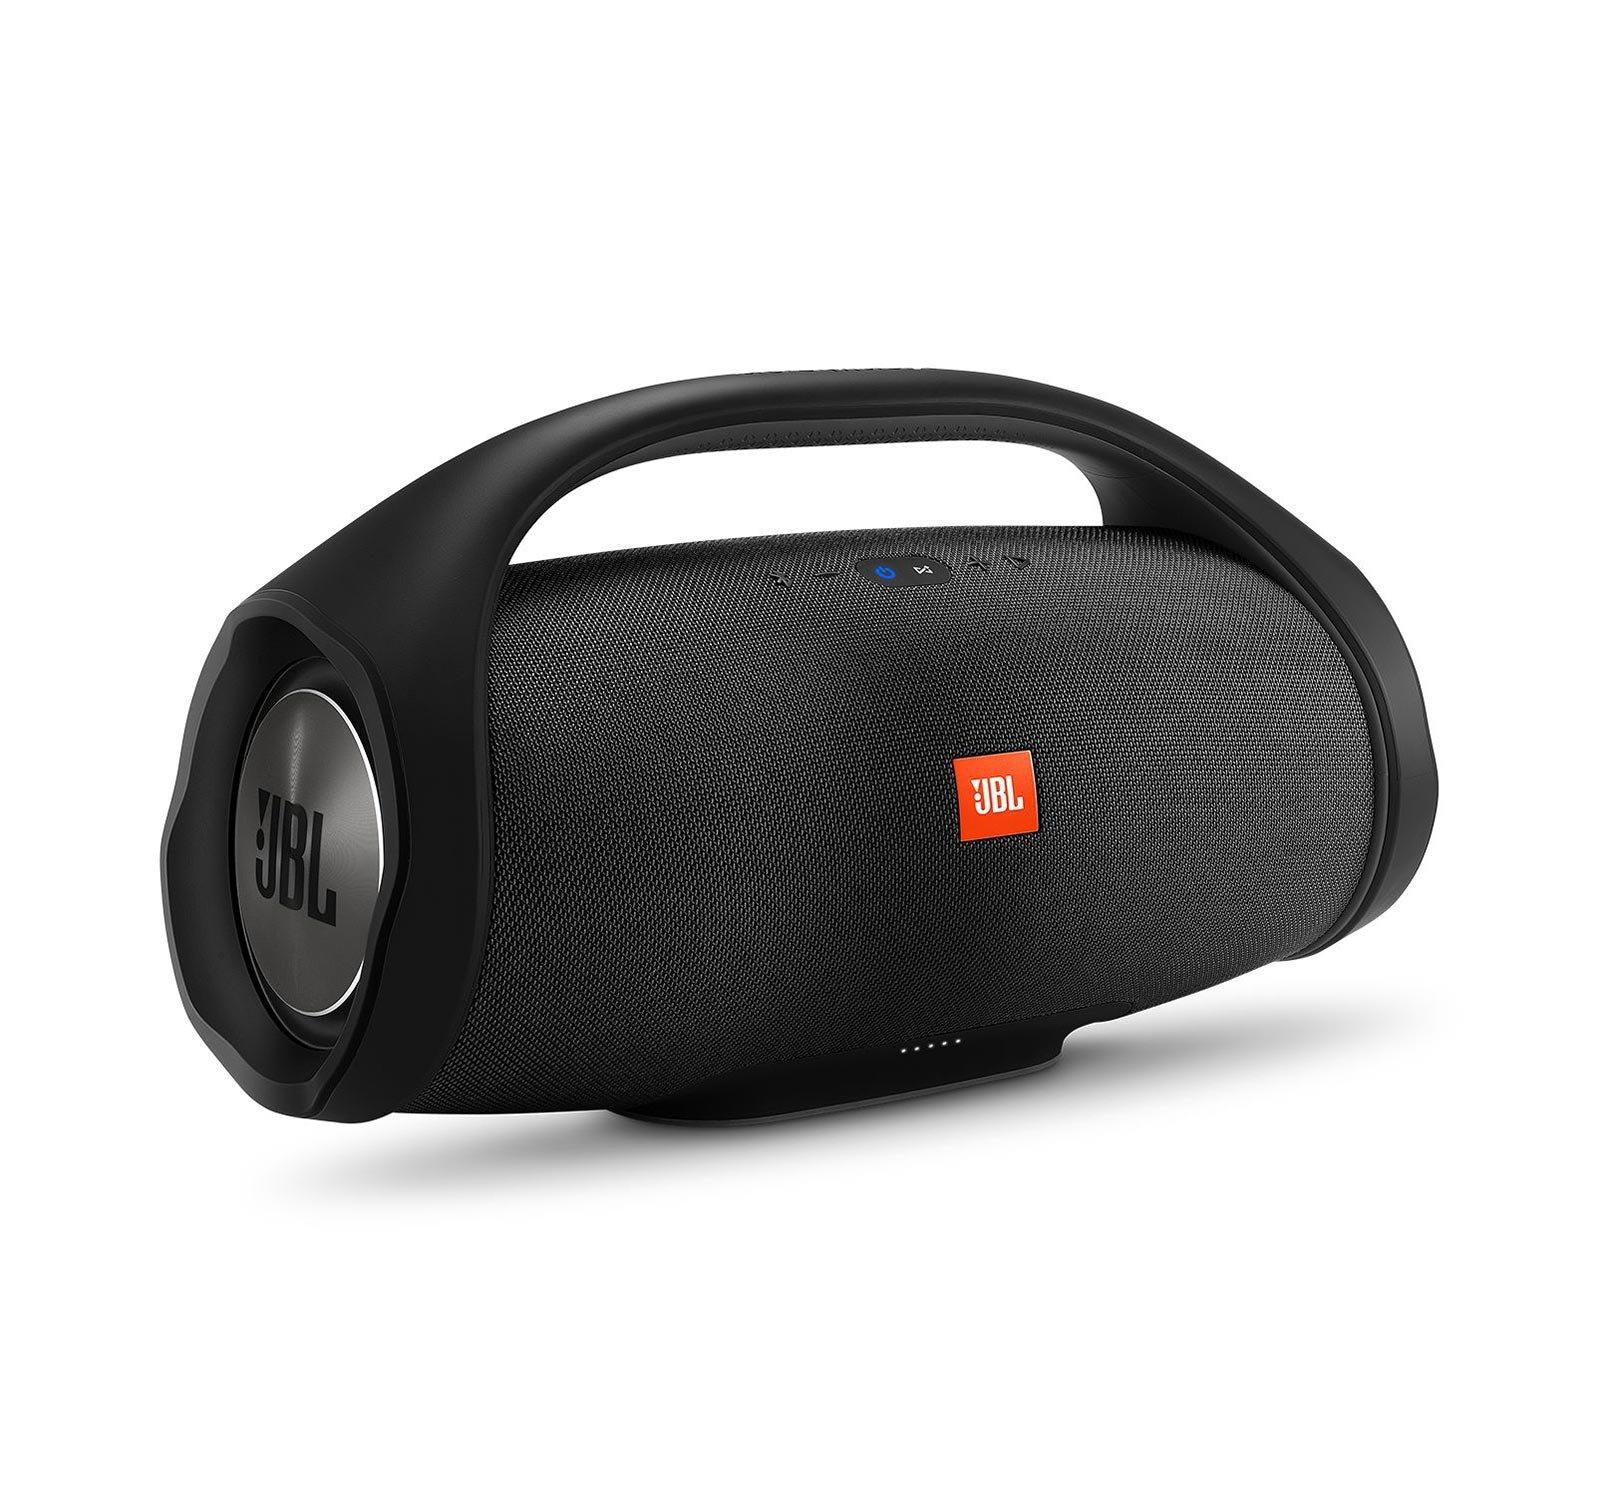 JBL Boombox Portable Bluetooth Waterproof Speaker Bundle with Hardshell Storage Case (Black) by JBL (Image #3)